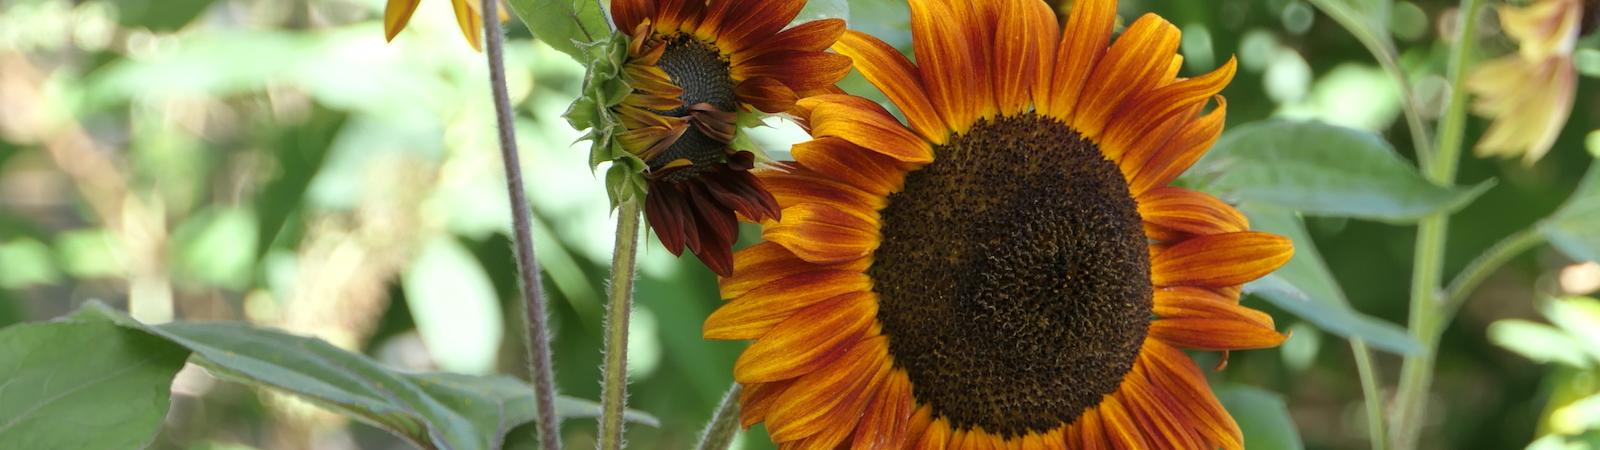 Sonnenblume_1600